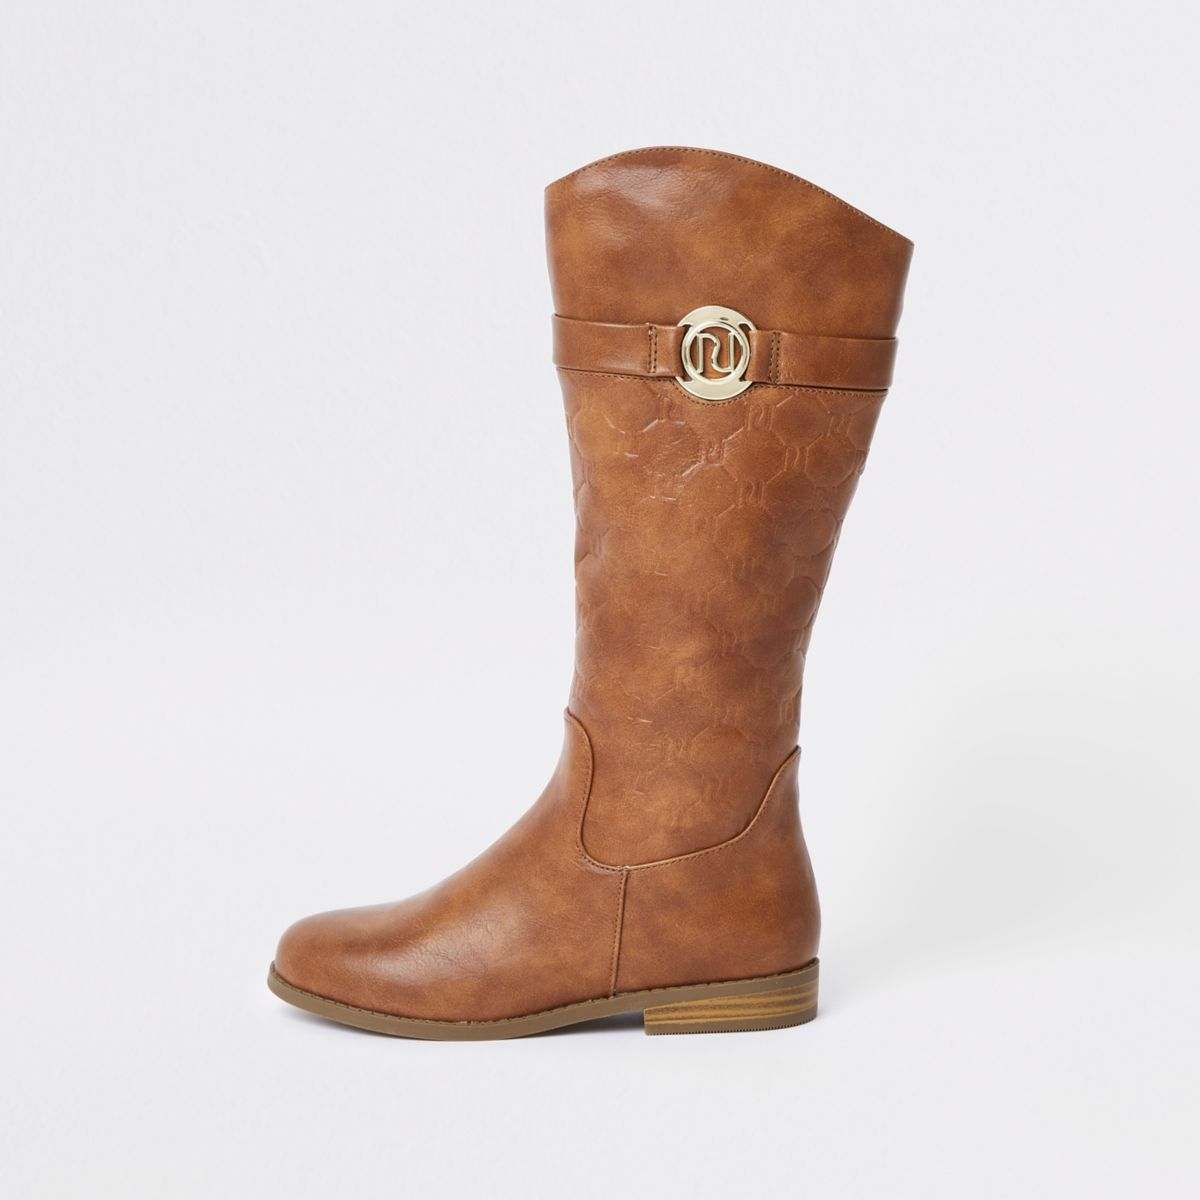 Girls brown RI monogram knee high boots